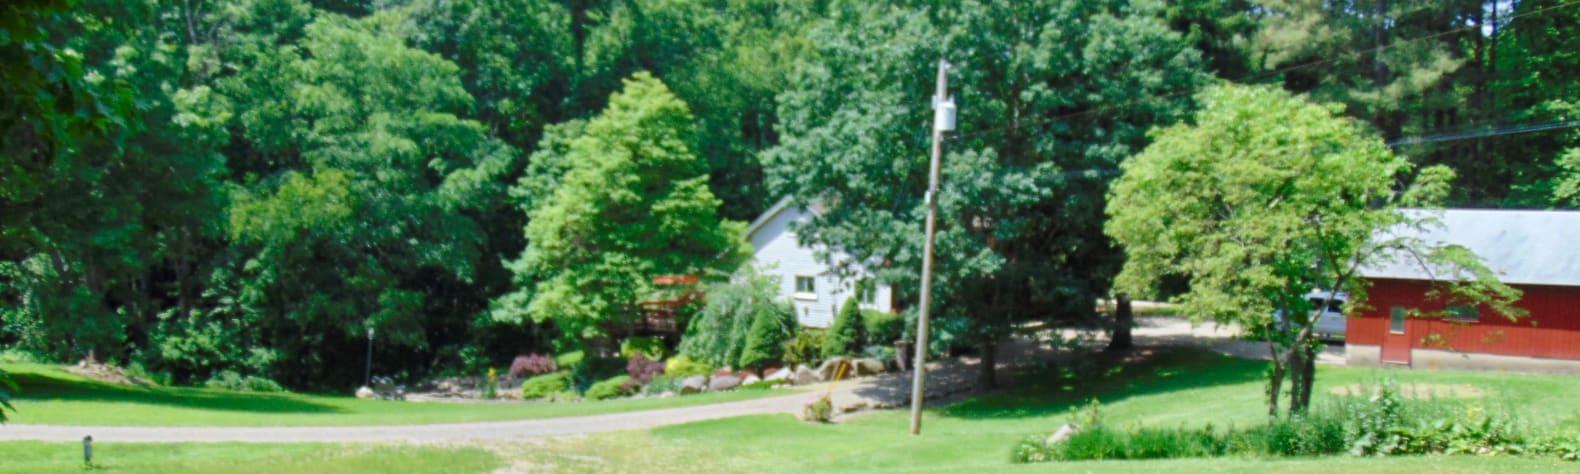 Bill S. and Nancy's property